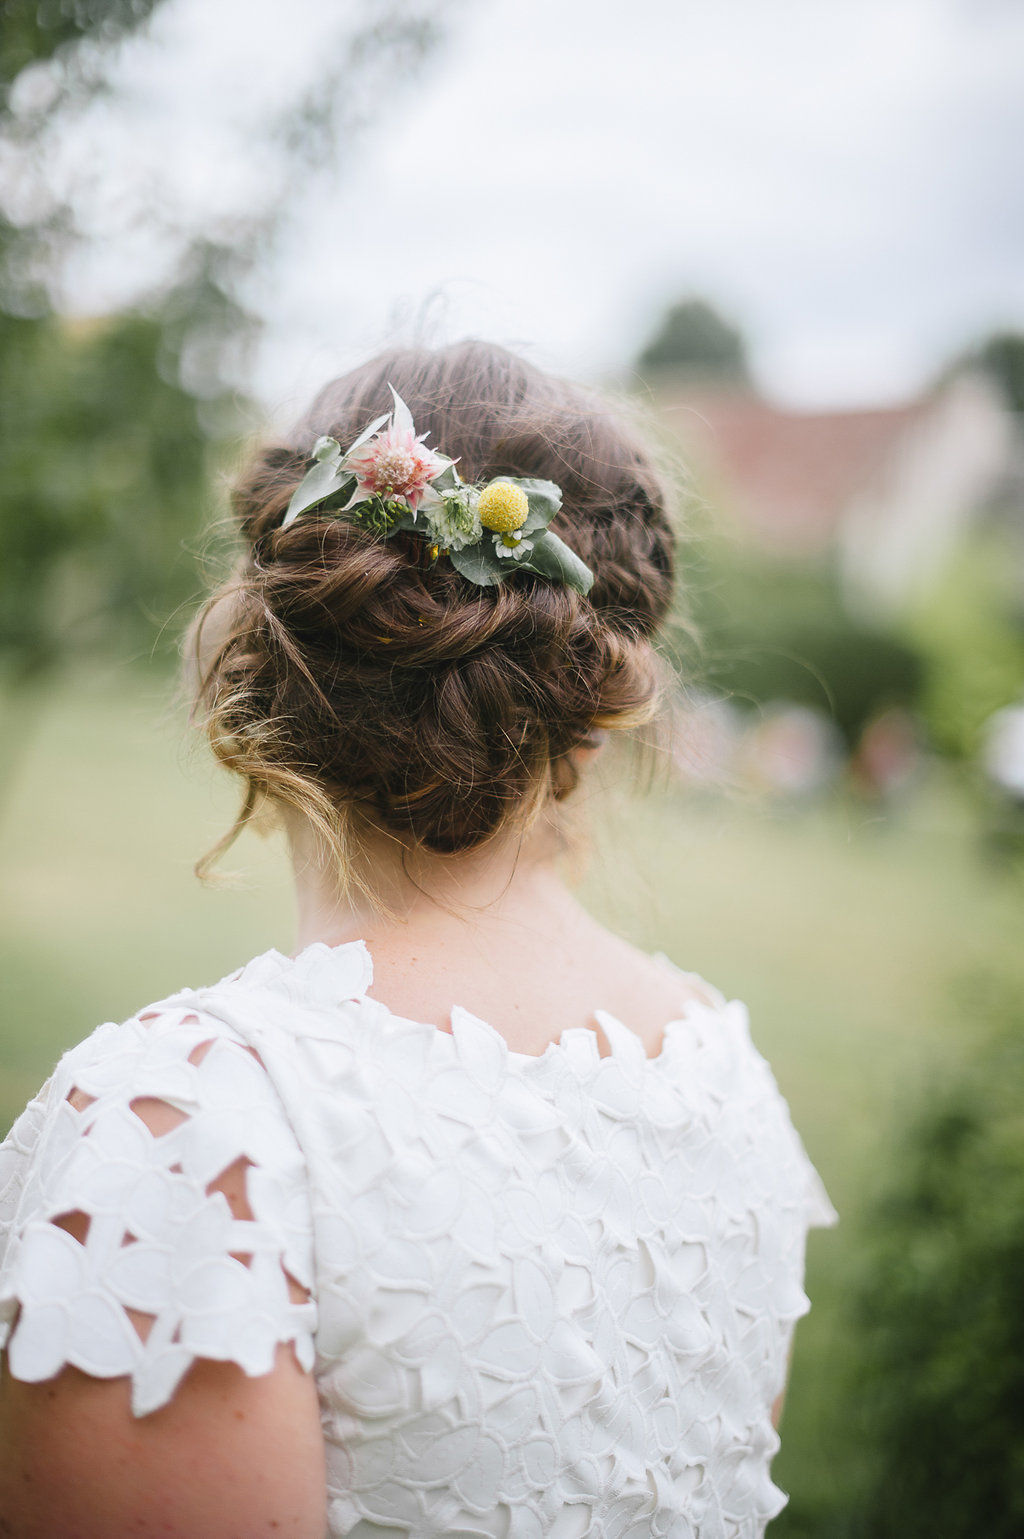 coiffure-peigne-fleuri-champetre-mariage